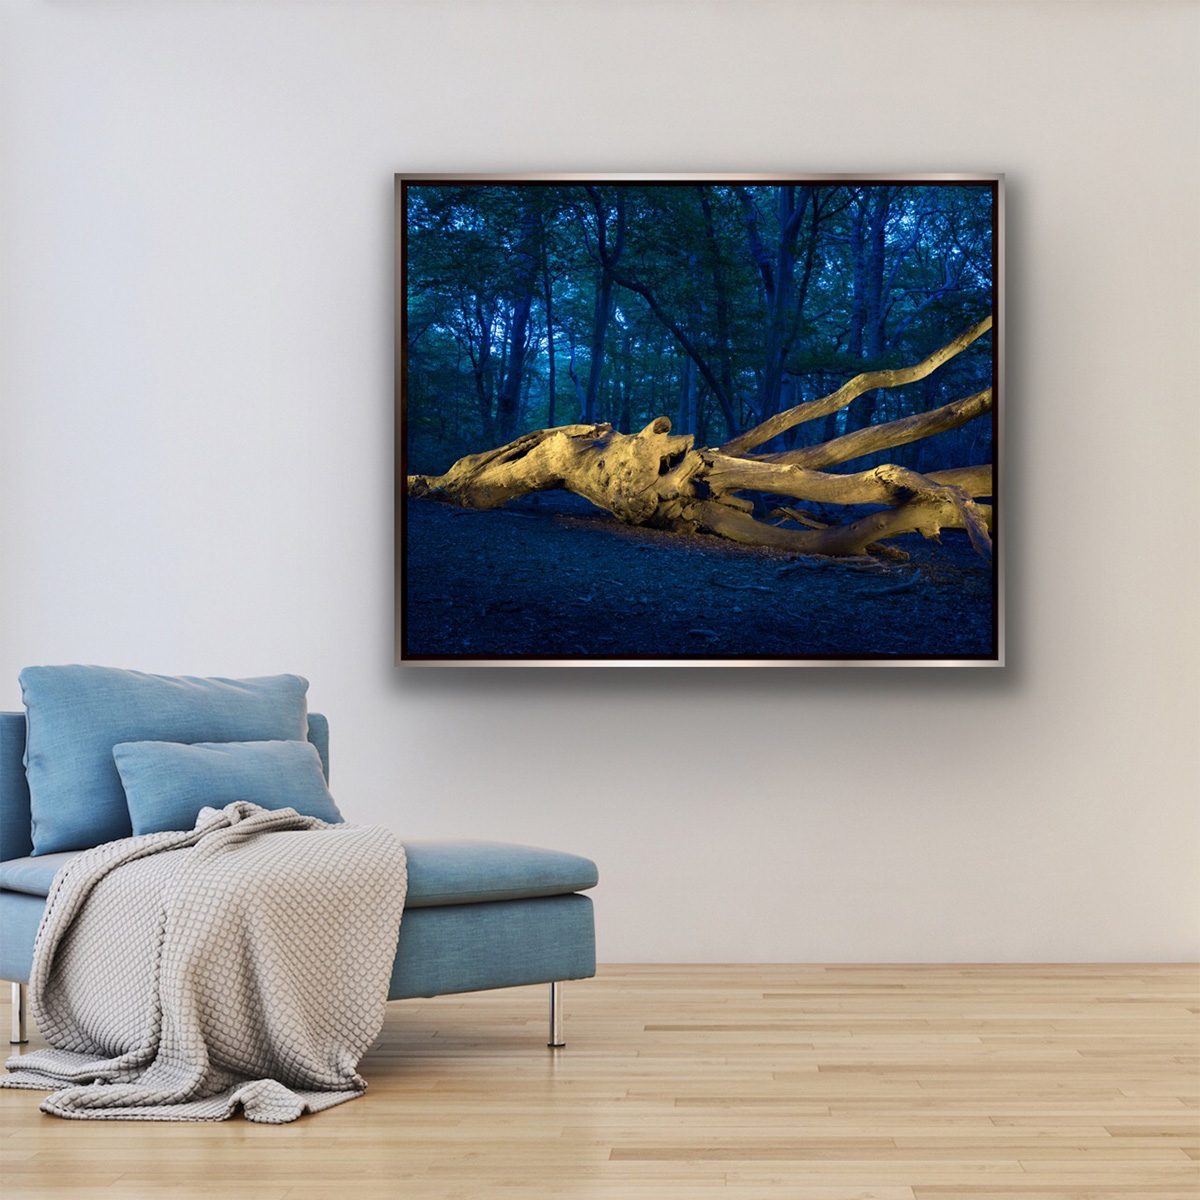 ARKE by Grete Hjorth-Johansen, viewed in a room